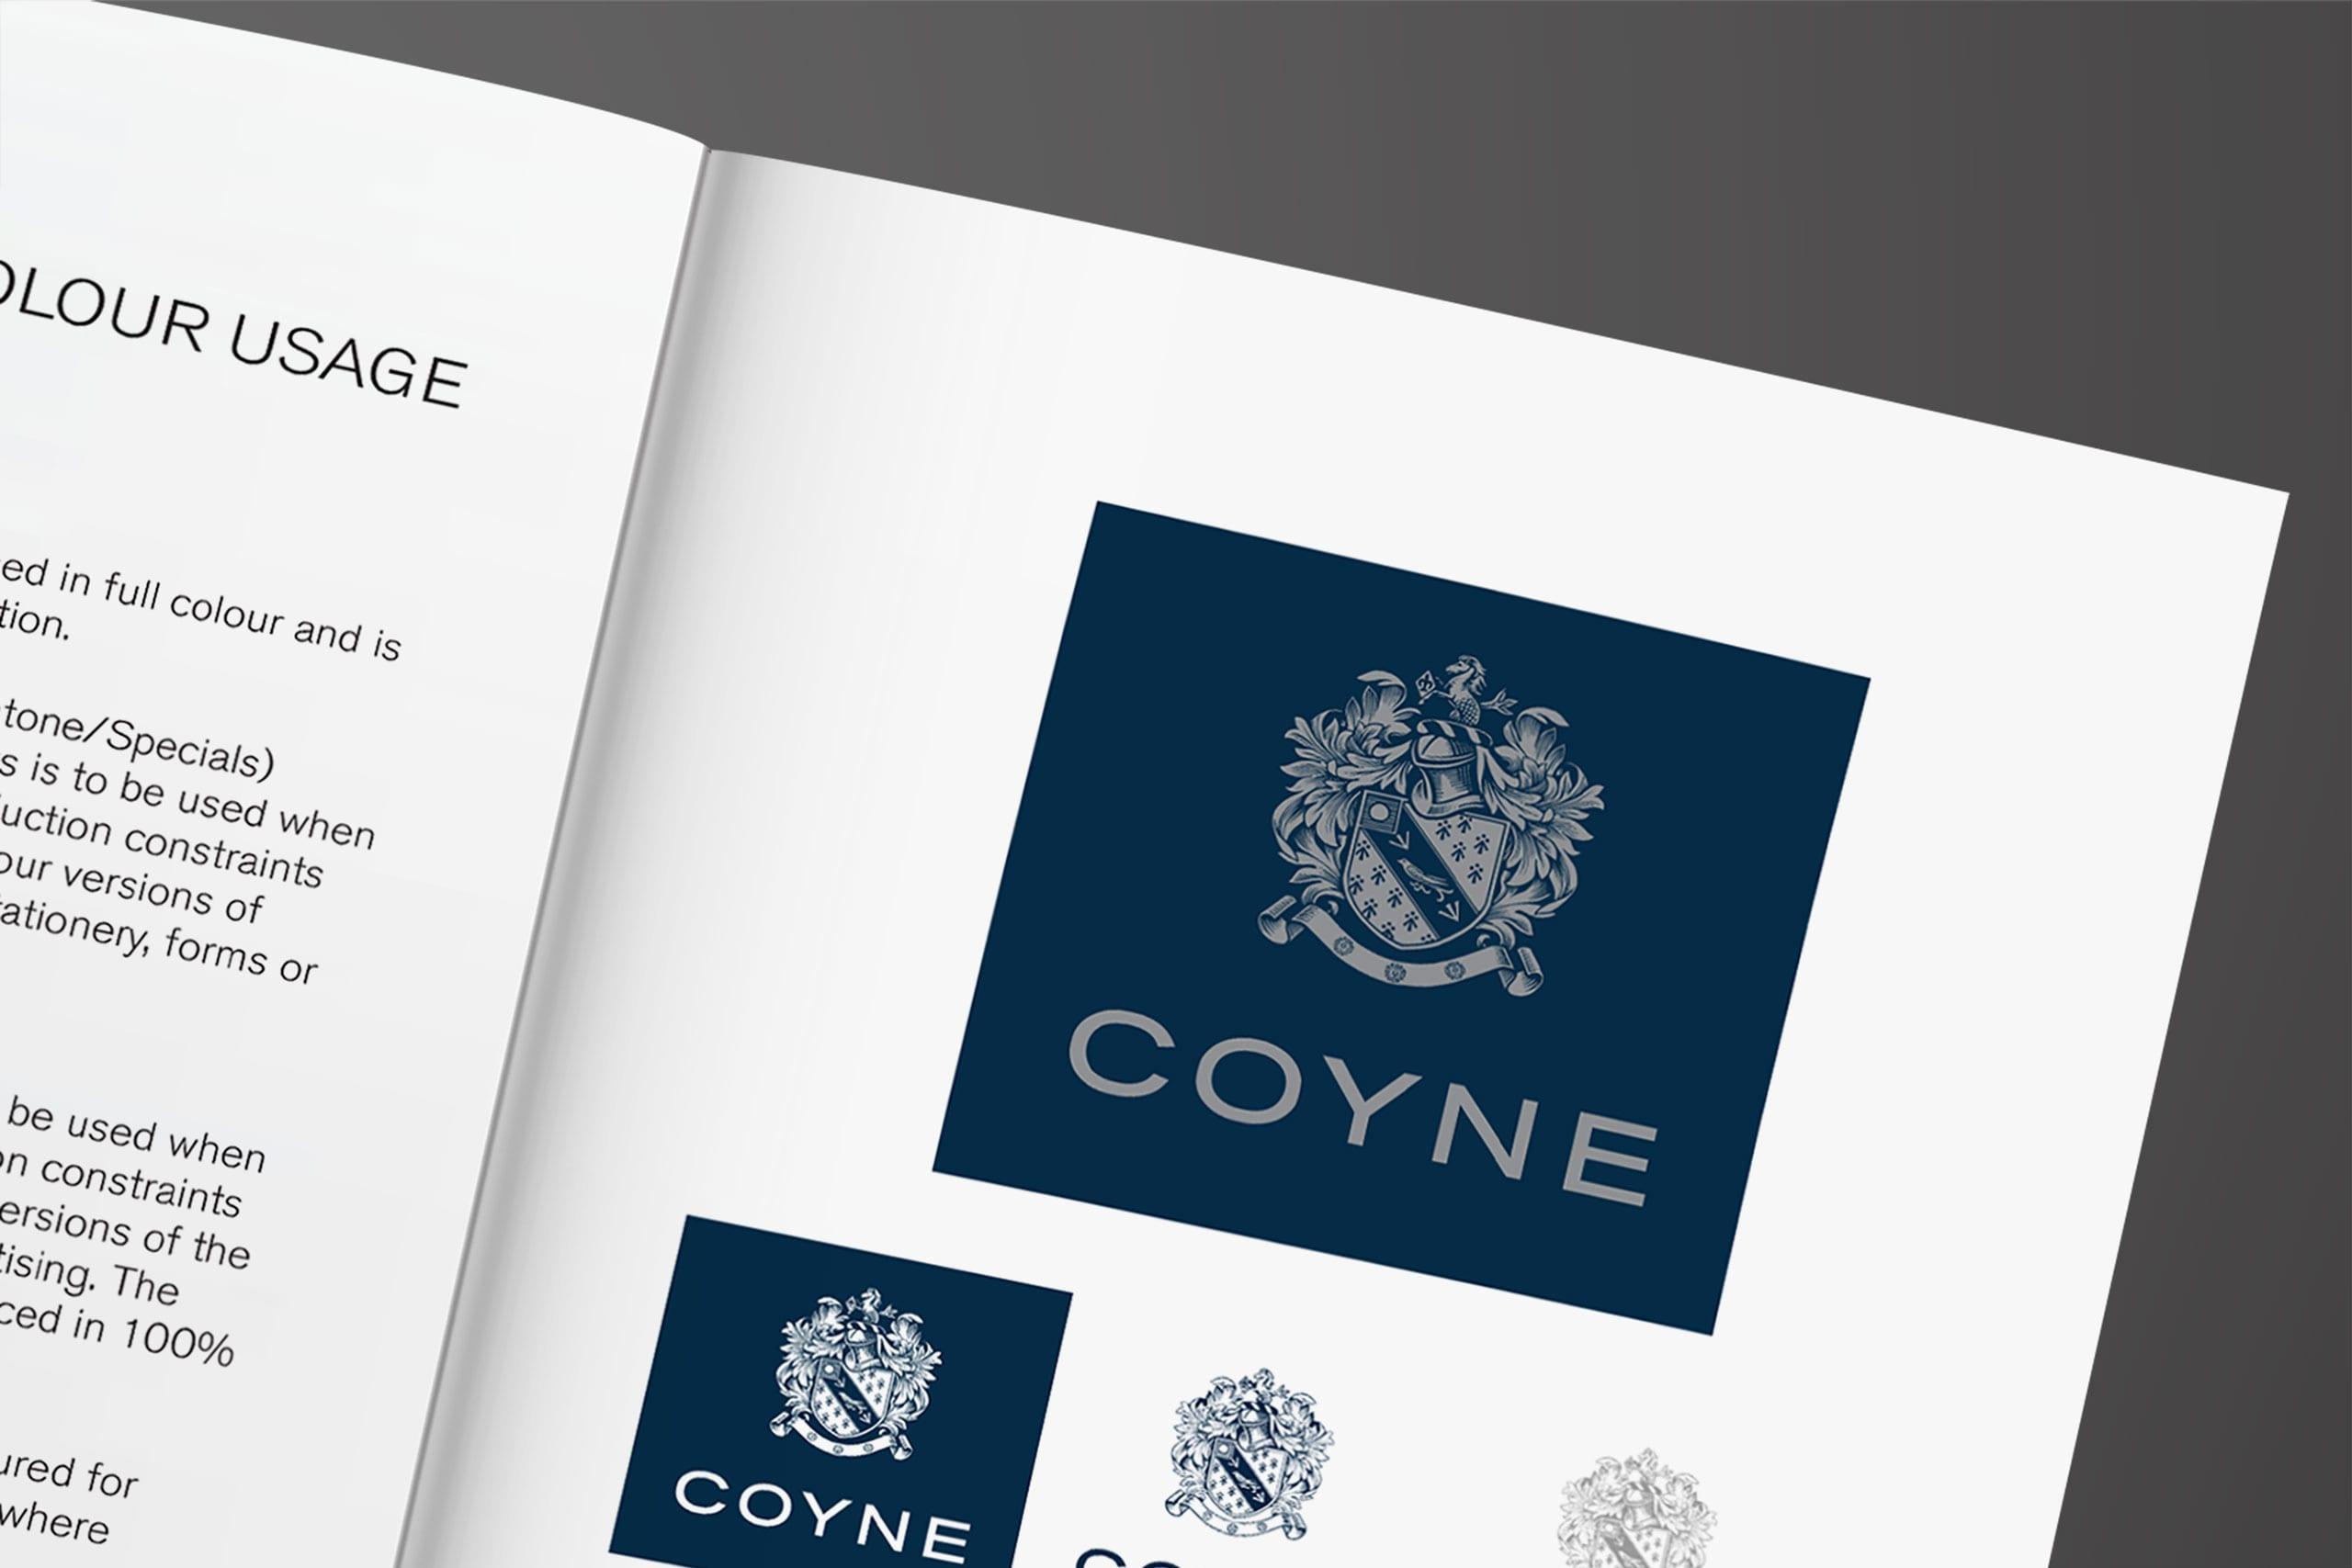 Coyne Brand | Property brand marketing